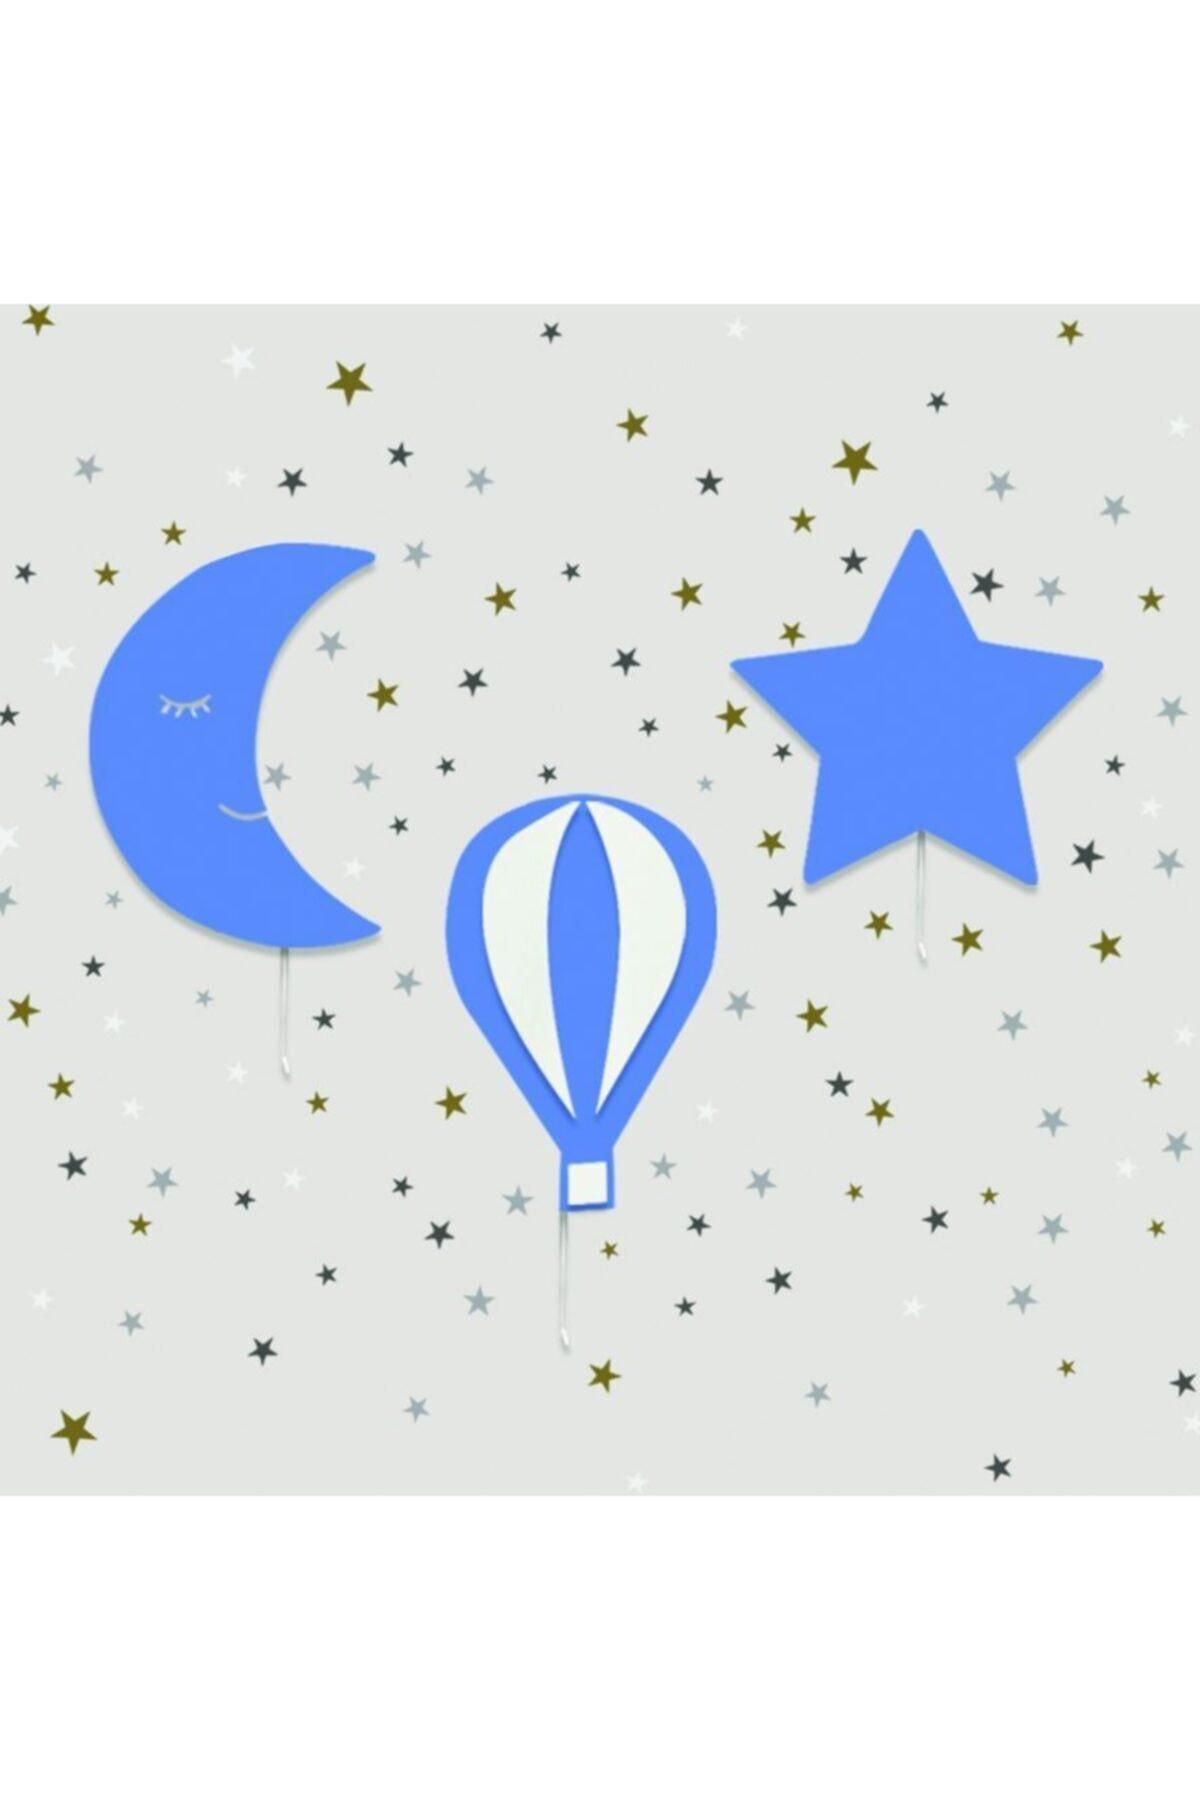 Set of 3- Star Balloon Moon Lamp Set Baby Bedside Night Light Nursery Wall Decor Montessori Furniture Colored Wall Light